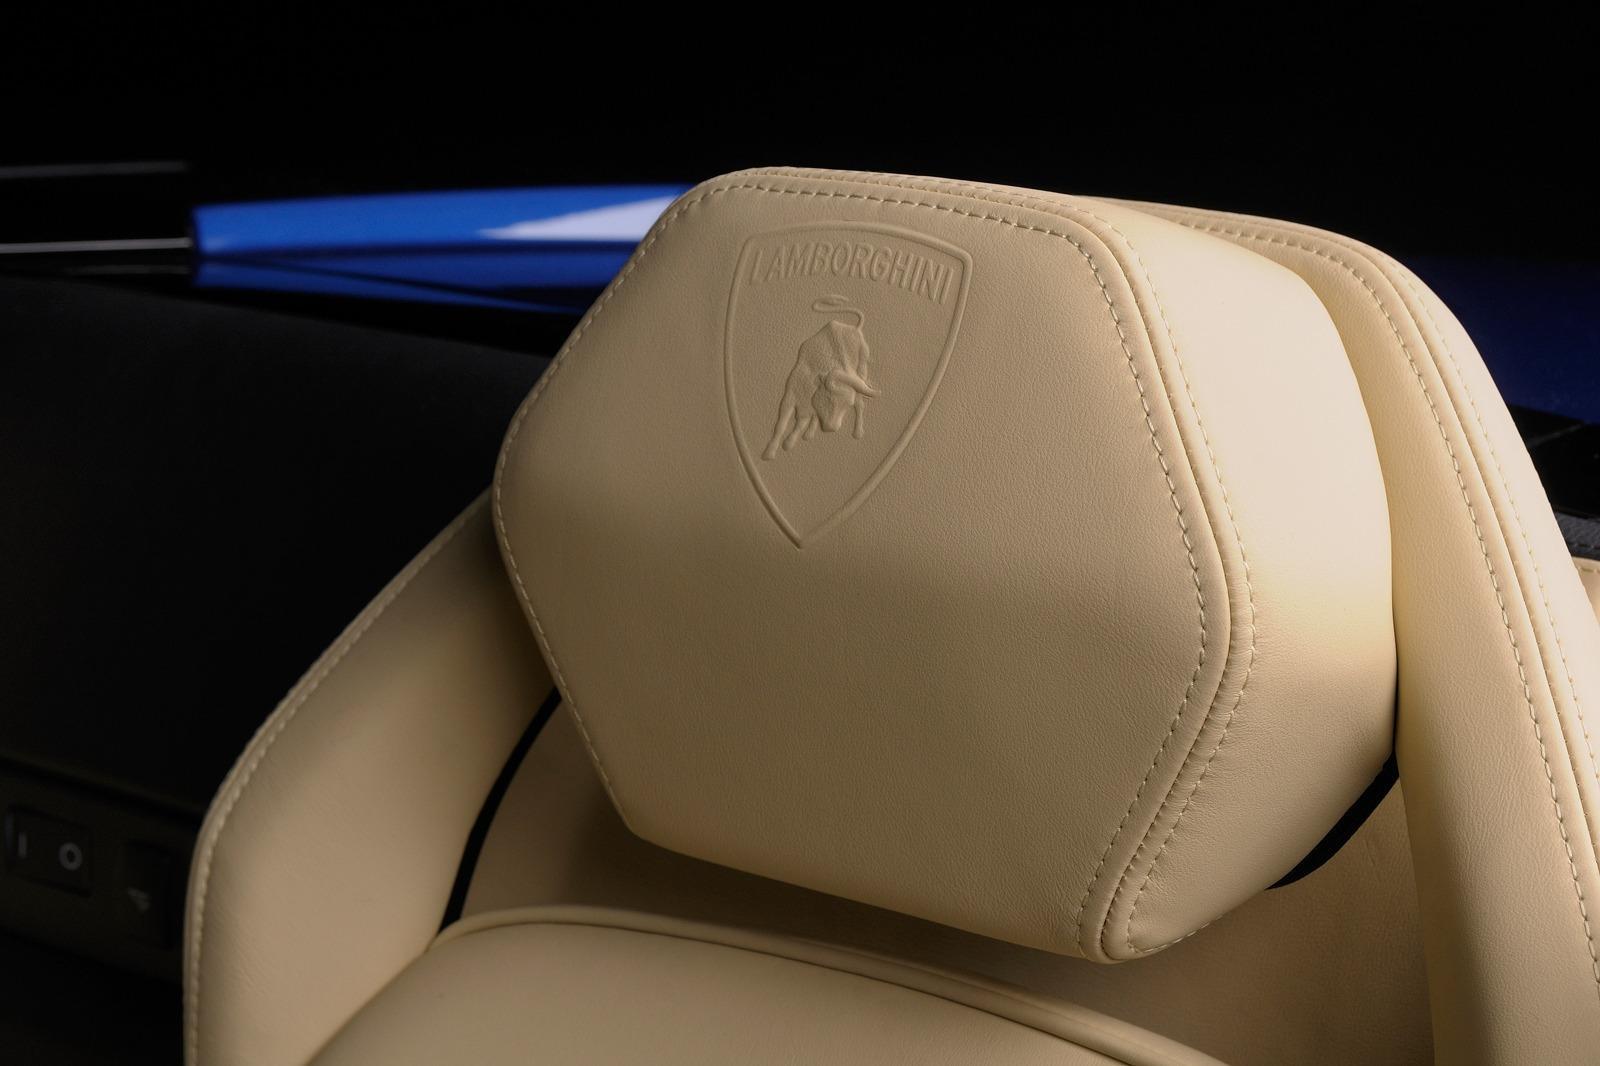 2012 Lamborghini Gallardo LP550-2 Spyder - фотография №5